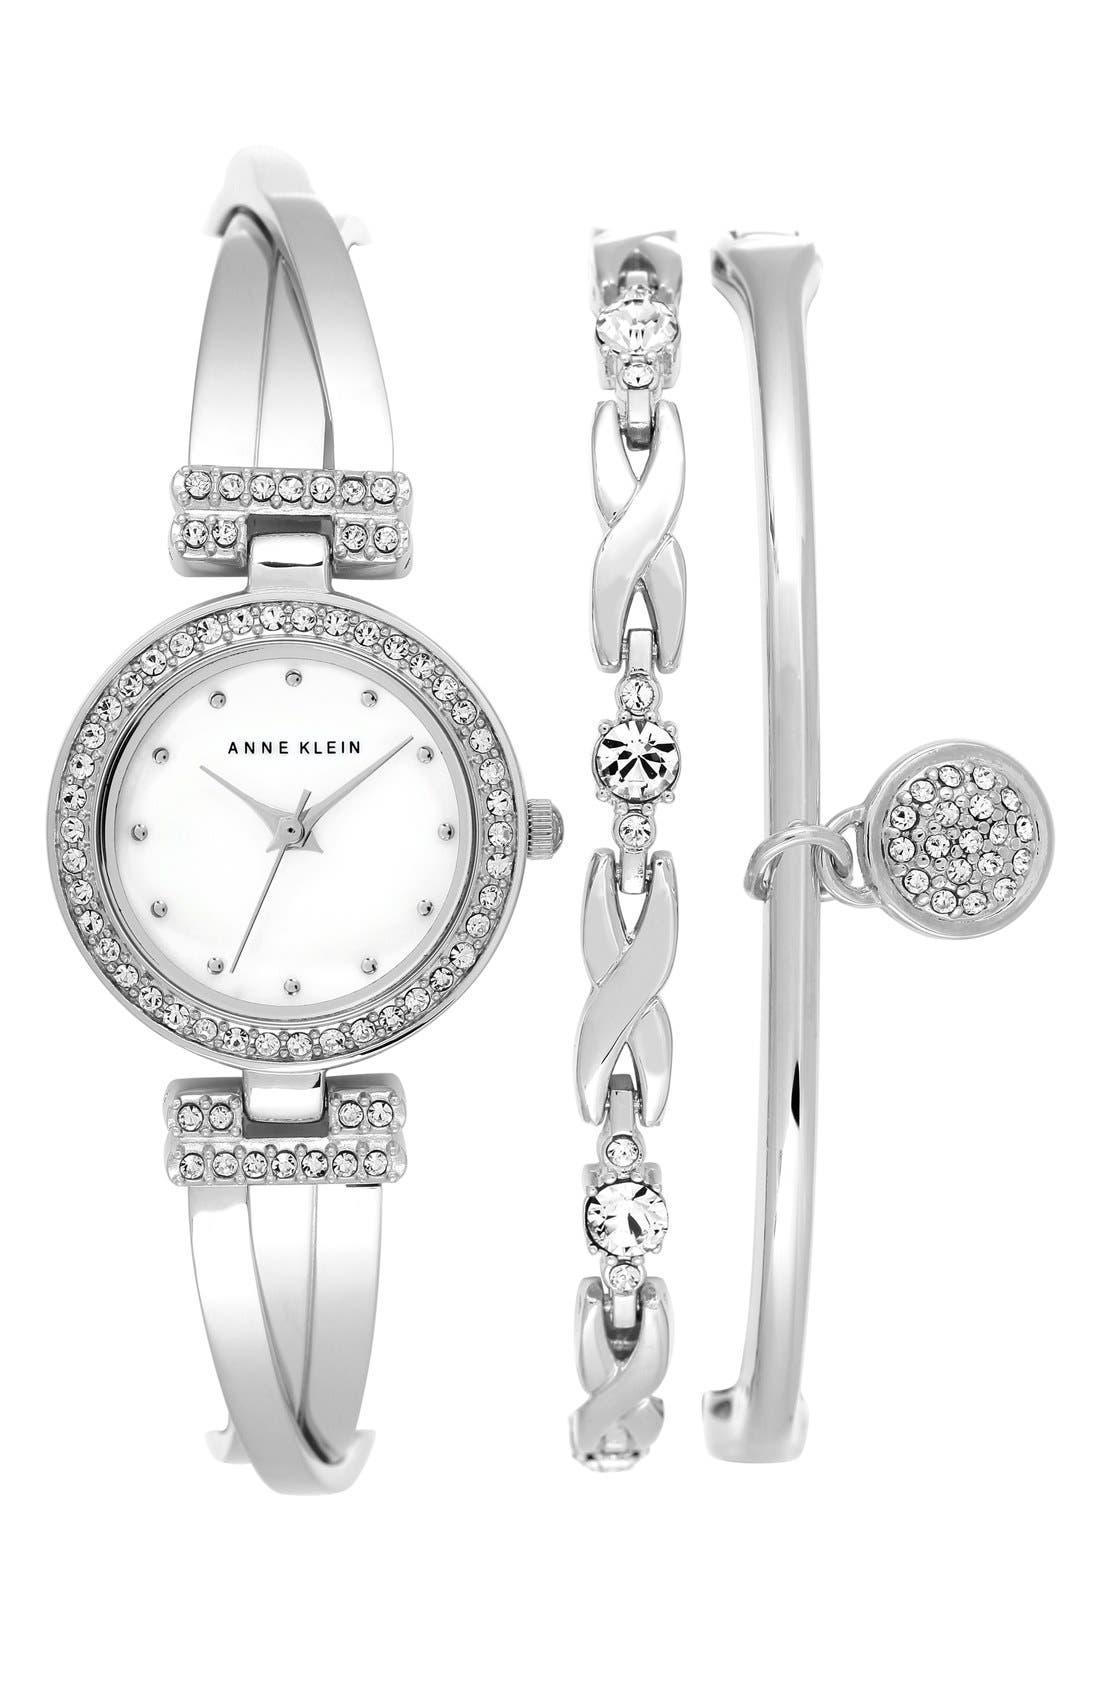 ANNE KLEIN Boxed Bracelet & Bangle Set, 24mm